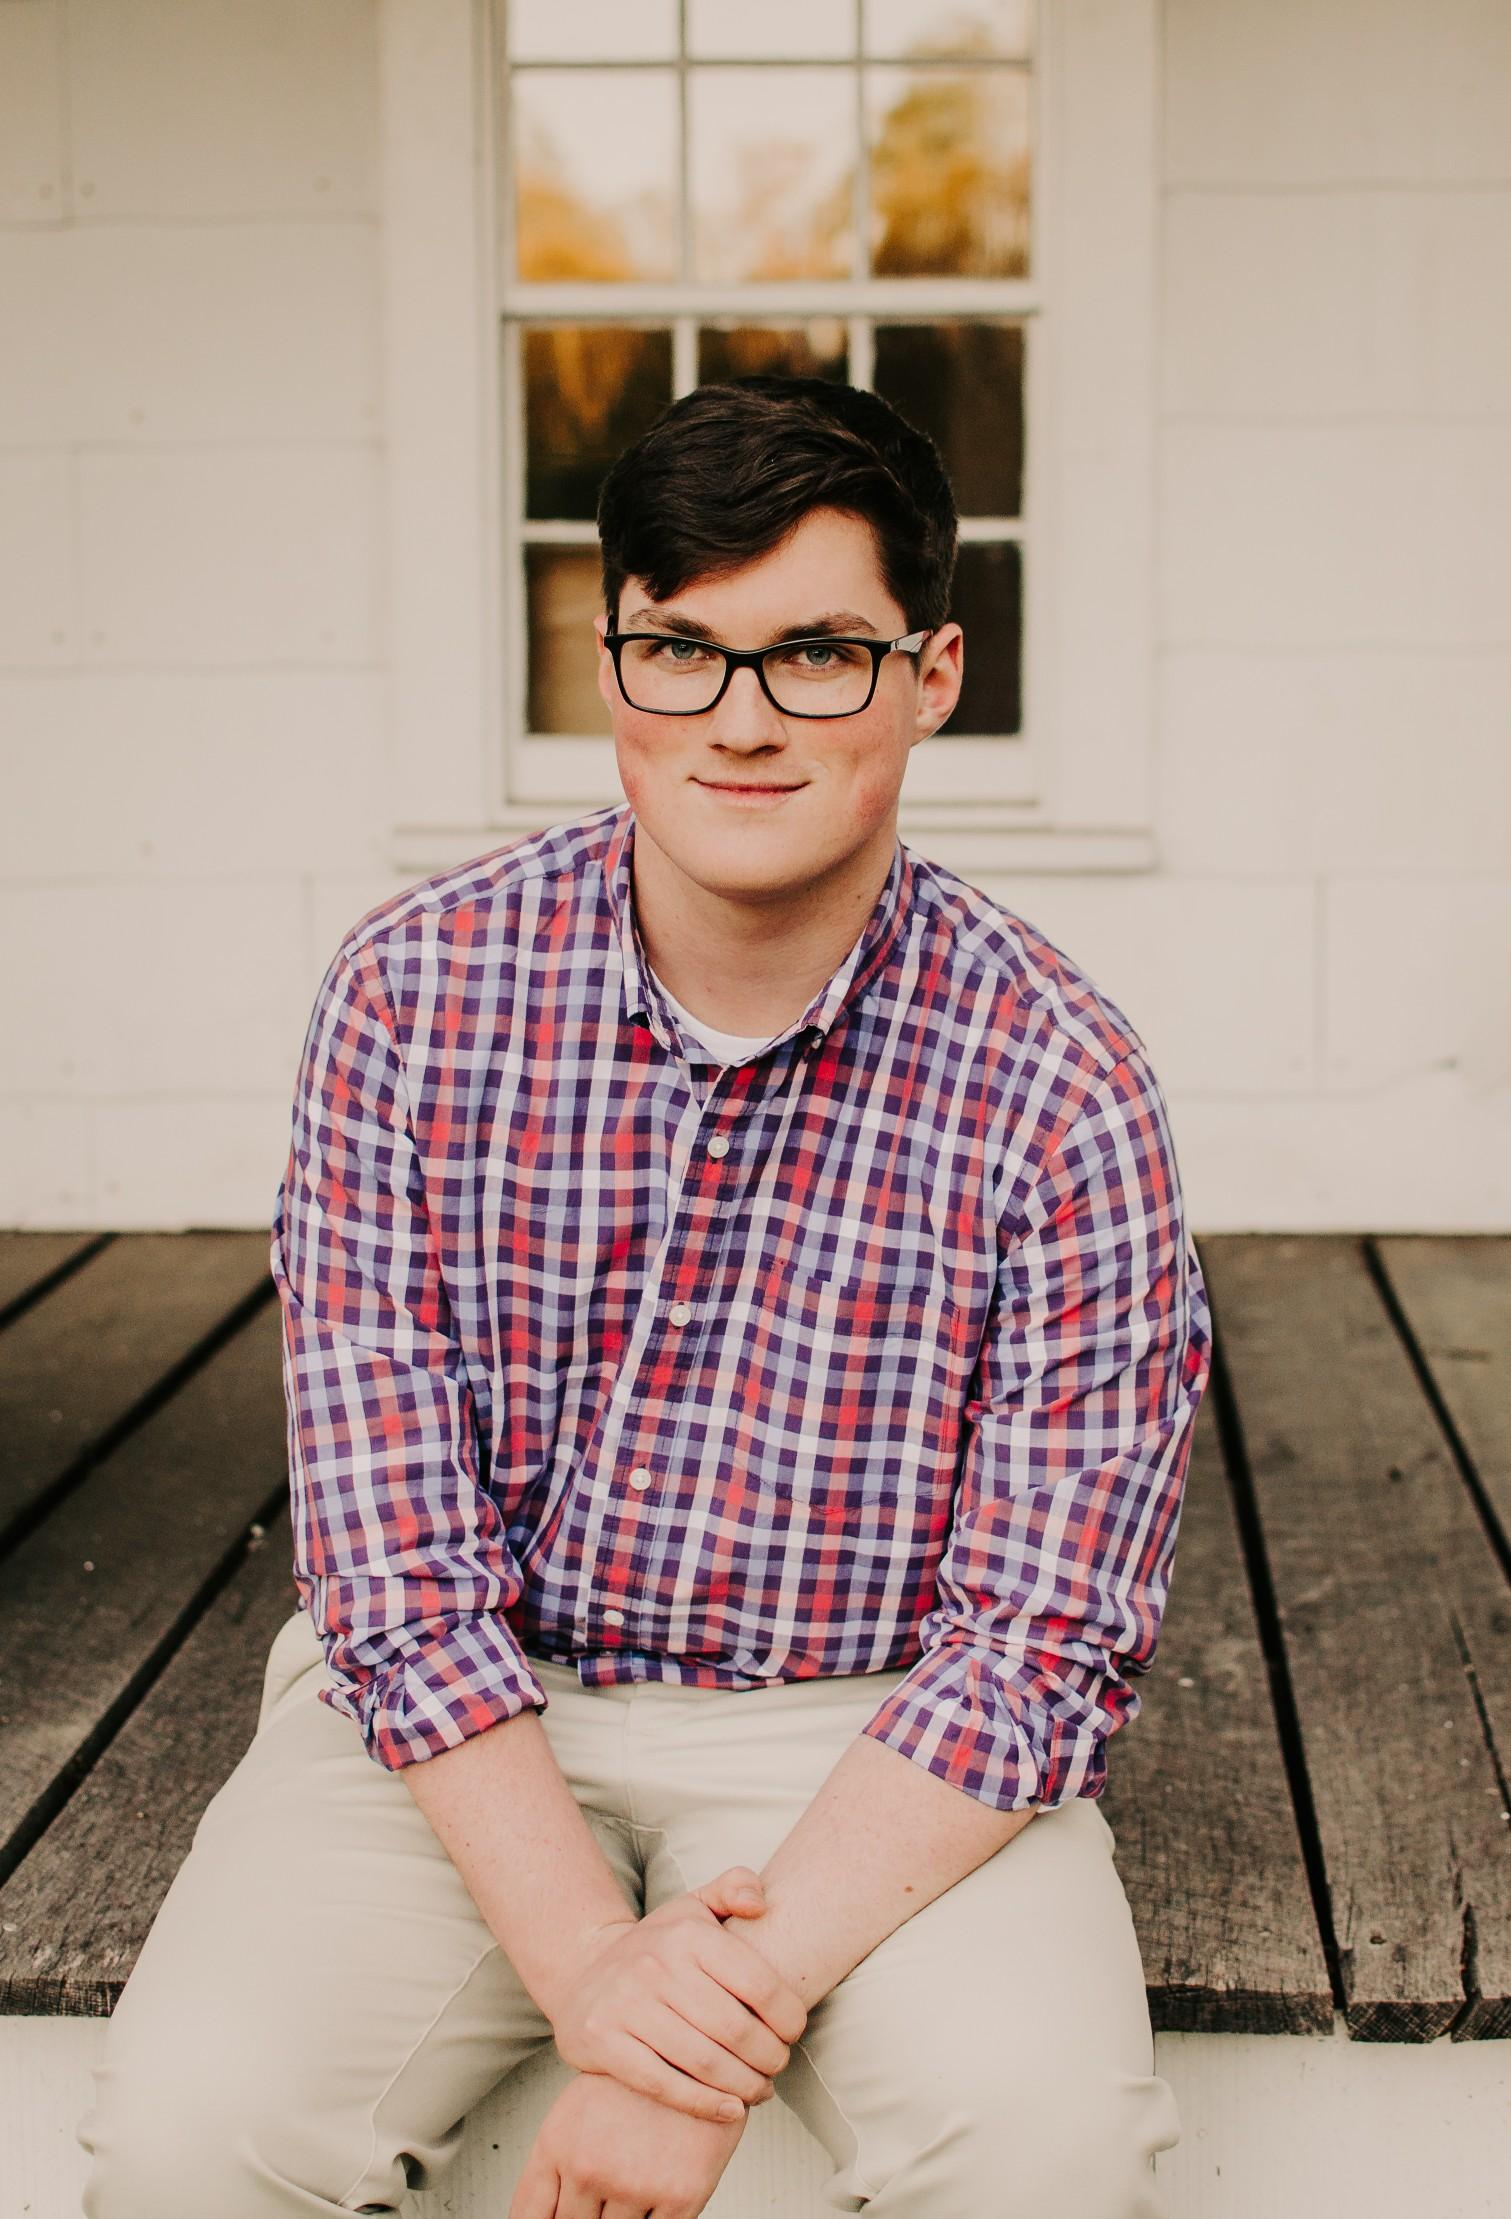 highschool-guy-senior-photography.jpg.